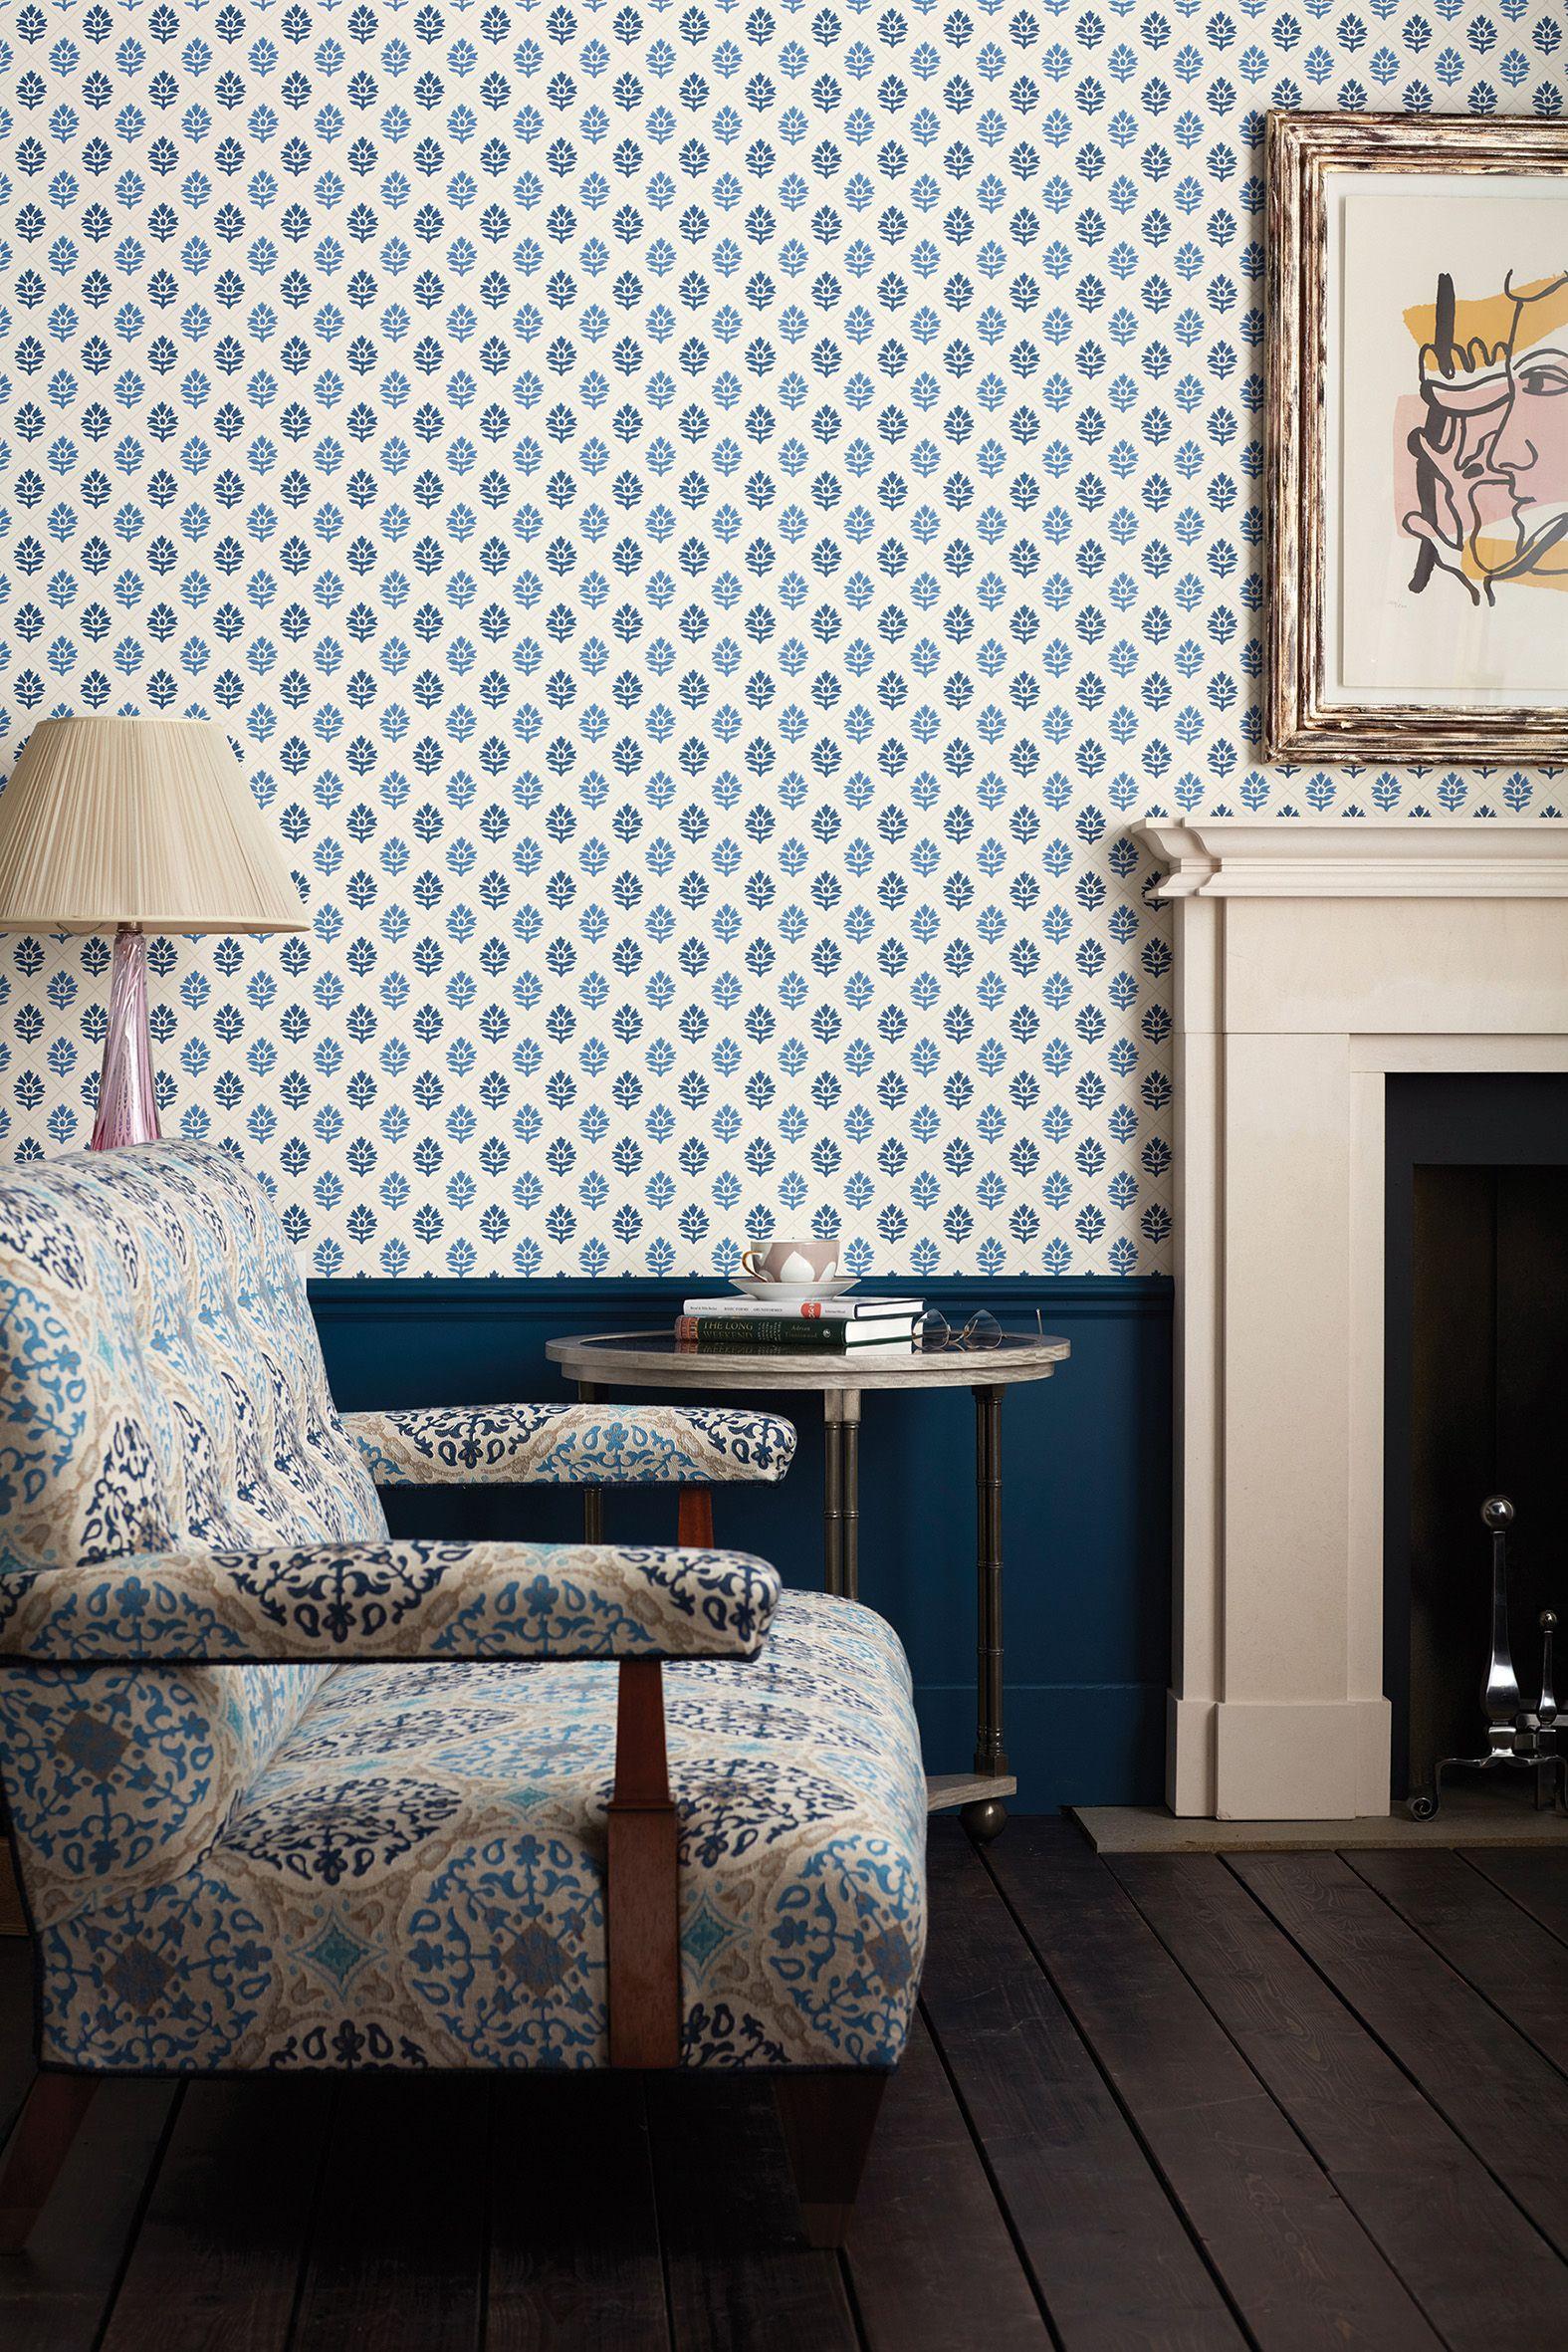 Pin by Osborne & Little on On Colour Blue & White Nina